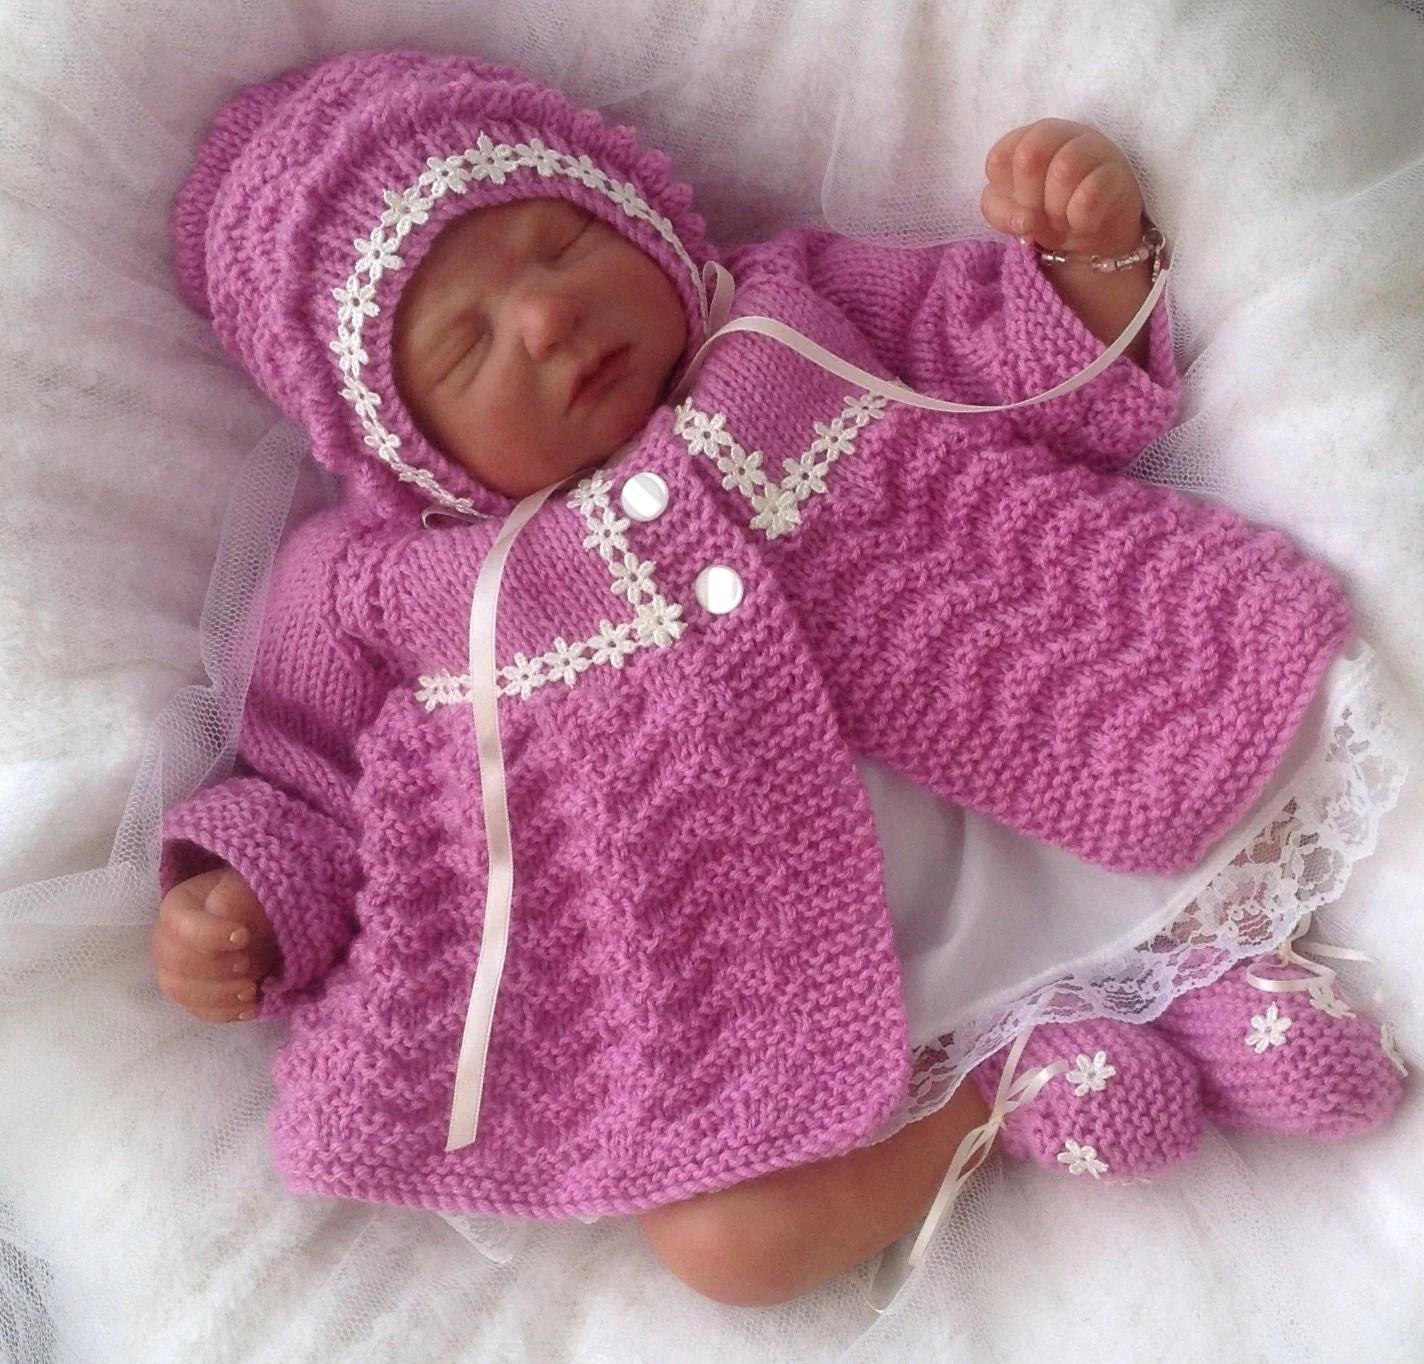 Baby Knitting Pattern Baby Girls Or Reborn Dolls Chevron